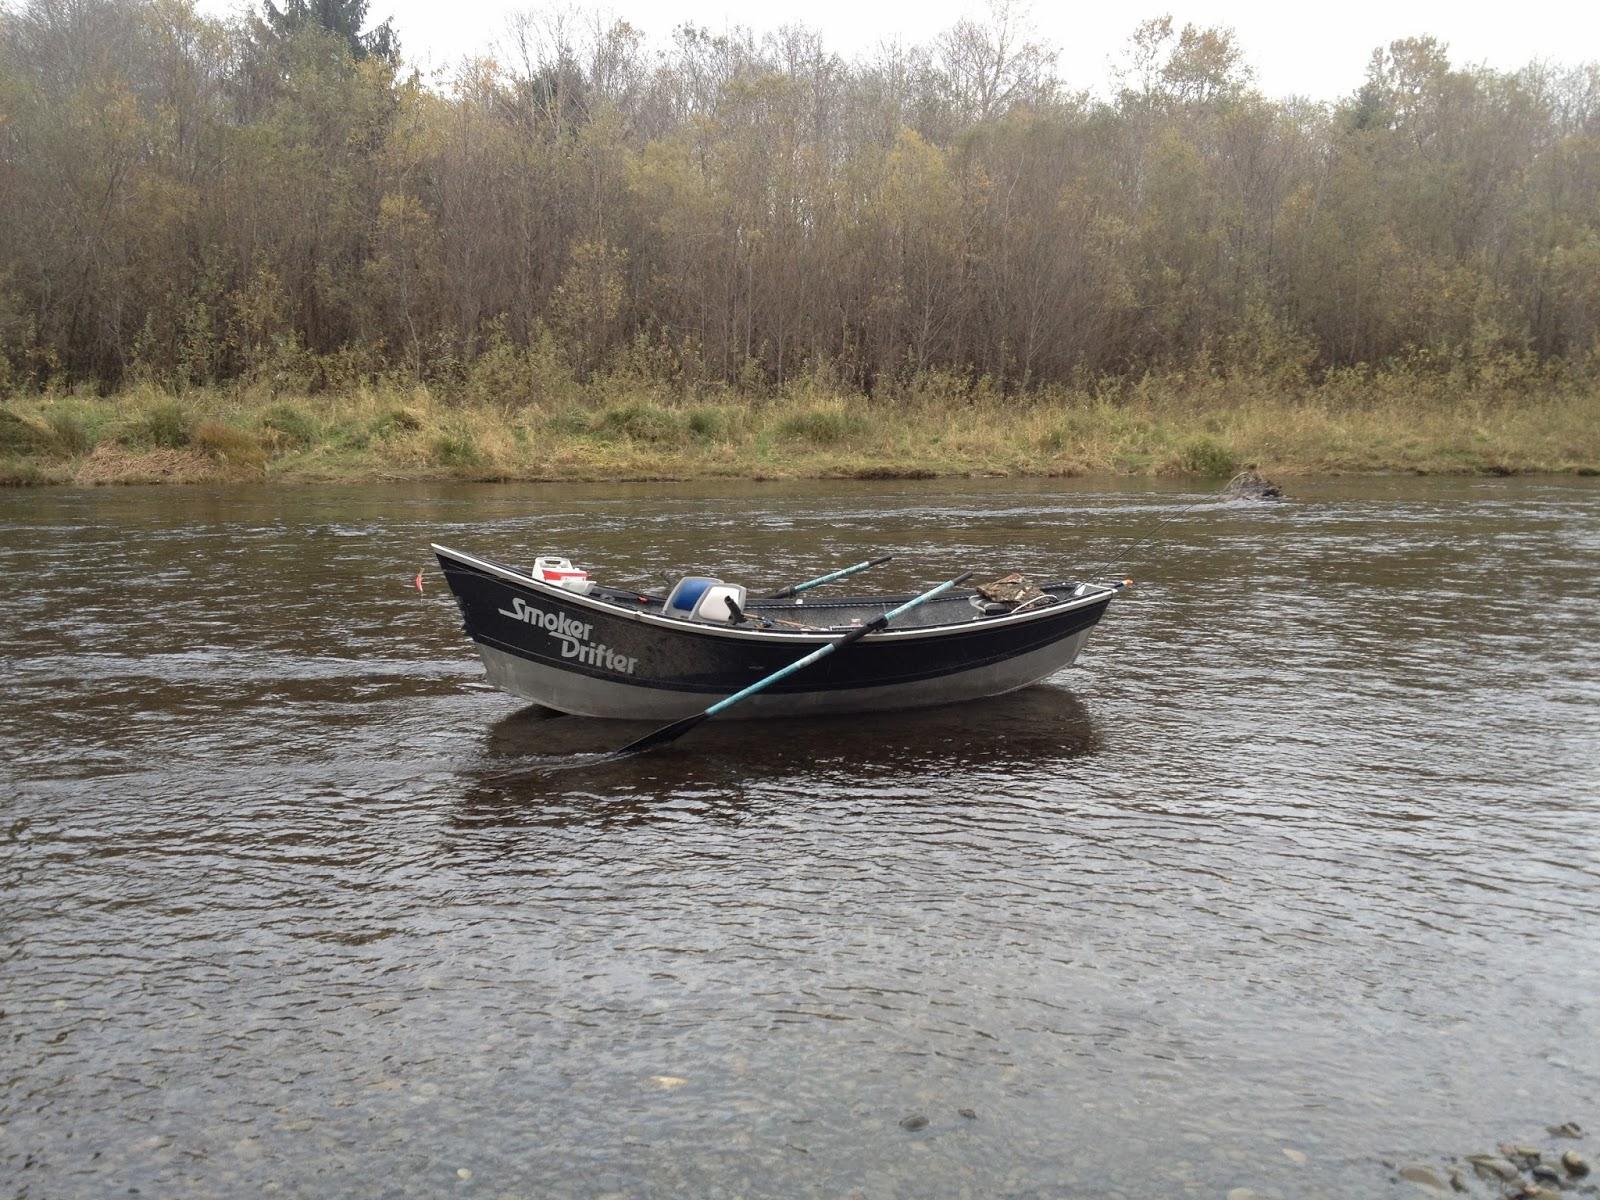 Spartan fishing outdoors fishing adventure recent for Drift boat fishing